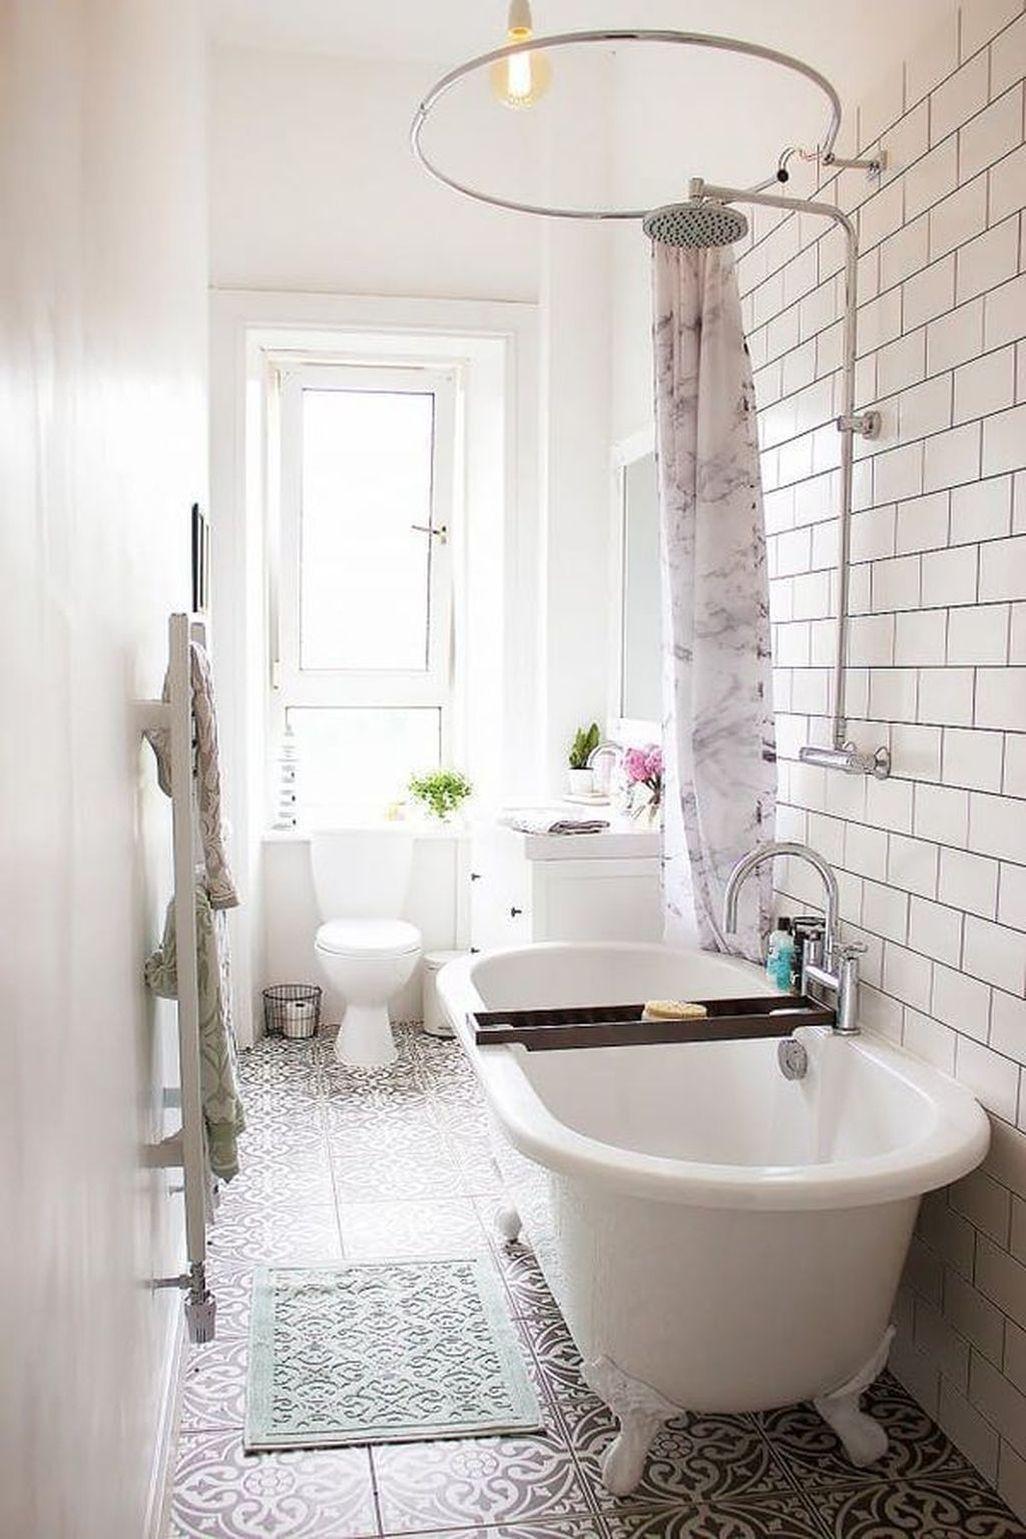 45 Amazing Modern Small Bathroom Design Ideas - HOMISHOME on Amazing Small Bathrooms  id=66537